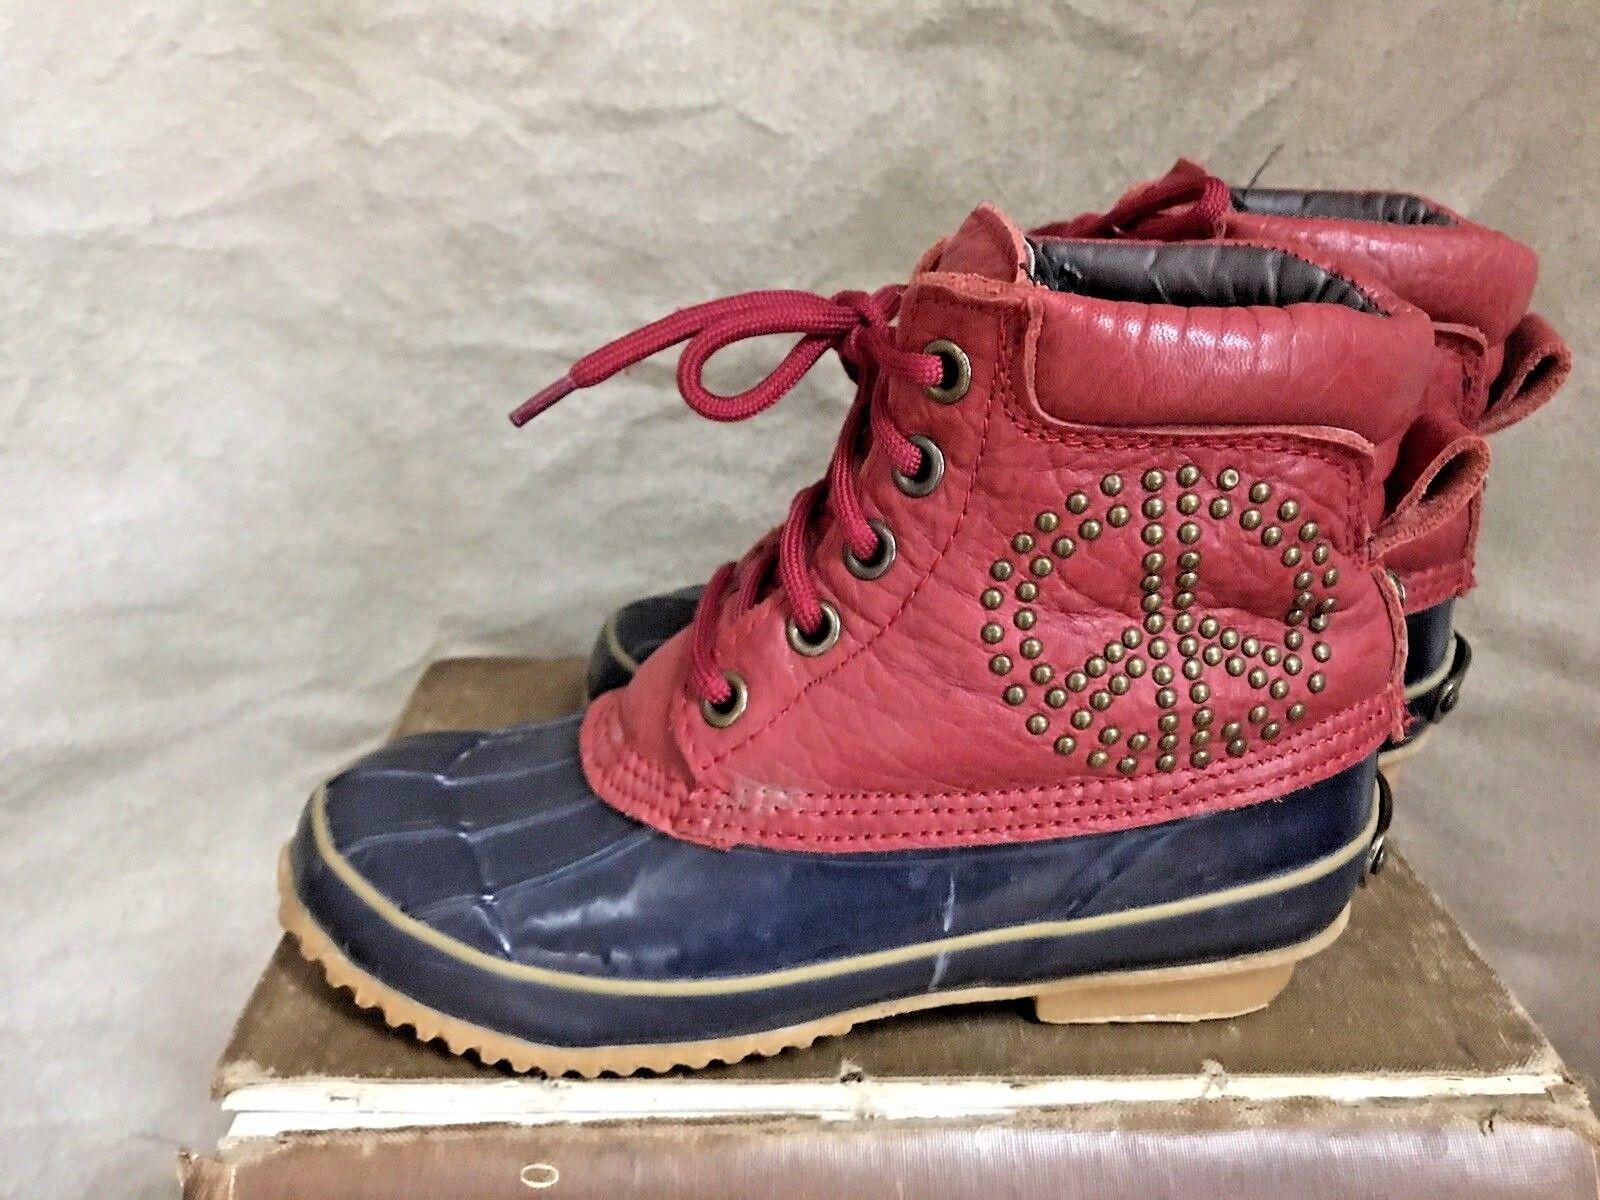 botas botas botas para mujer 6 36 Rubber Duck Muck signo de la paz tobillo Lucky Brand Rojo Azul Zapato  saludable